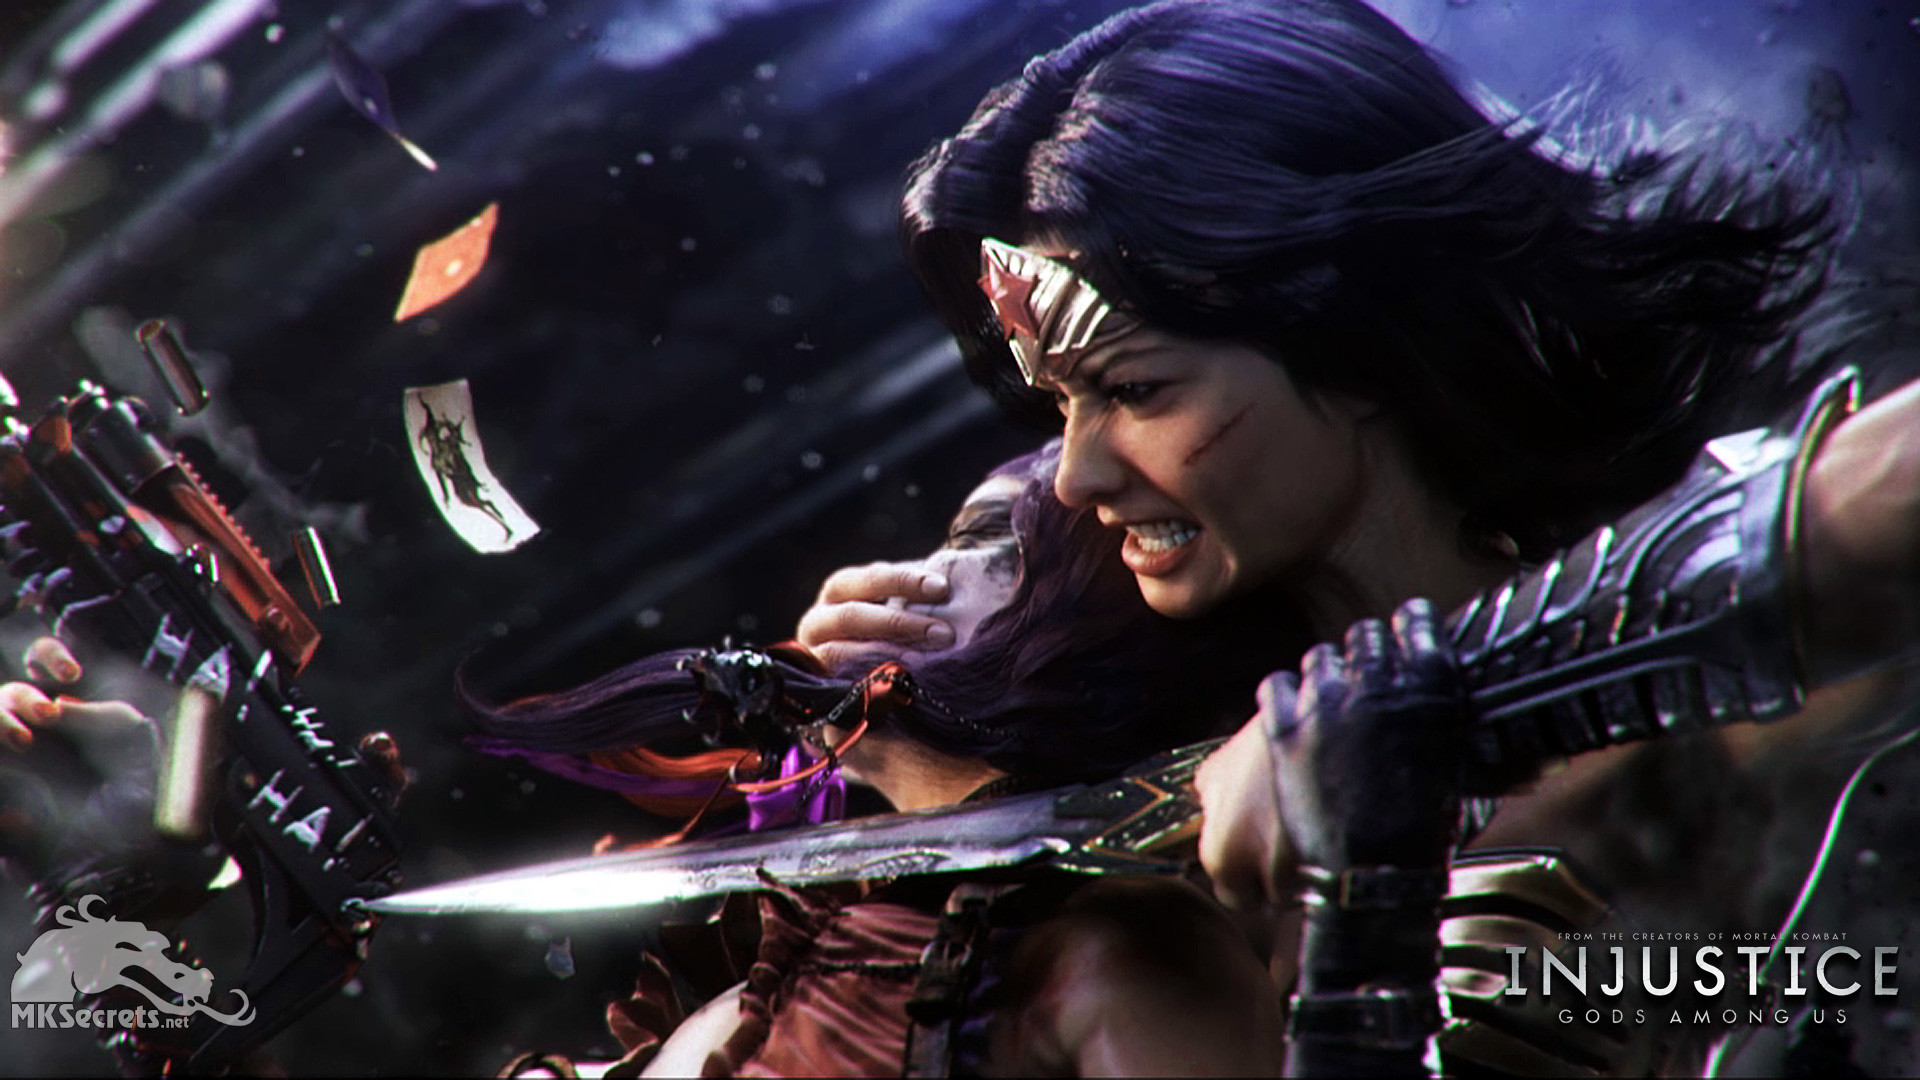 Injustice: Gods Among Us – Wonder Woman and Harley Quinn Wallpaper .